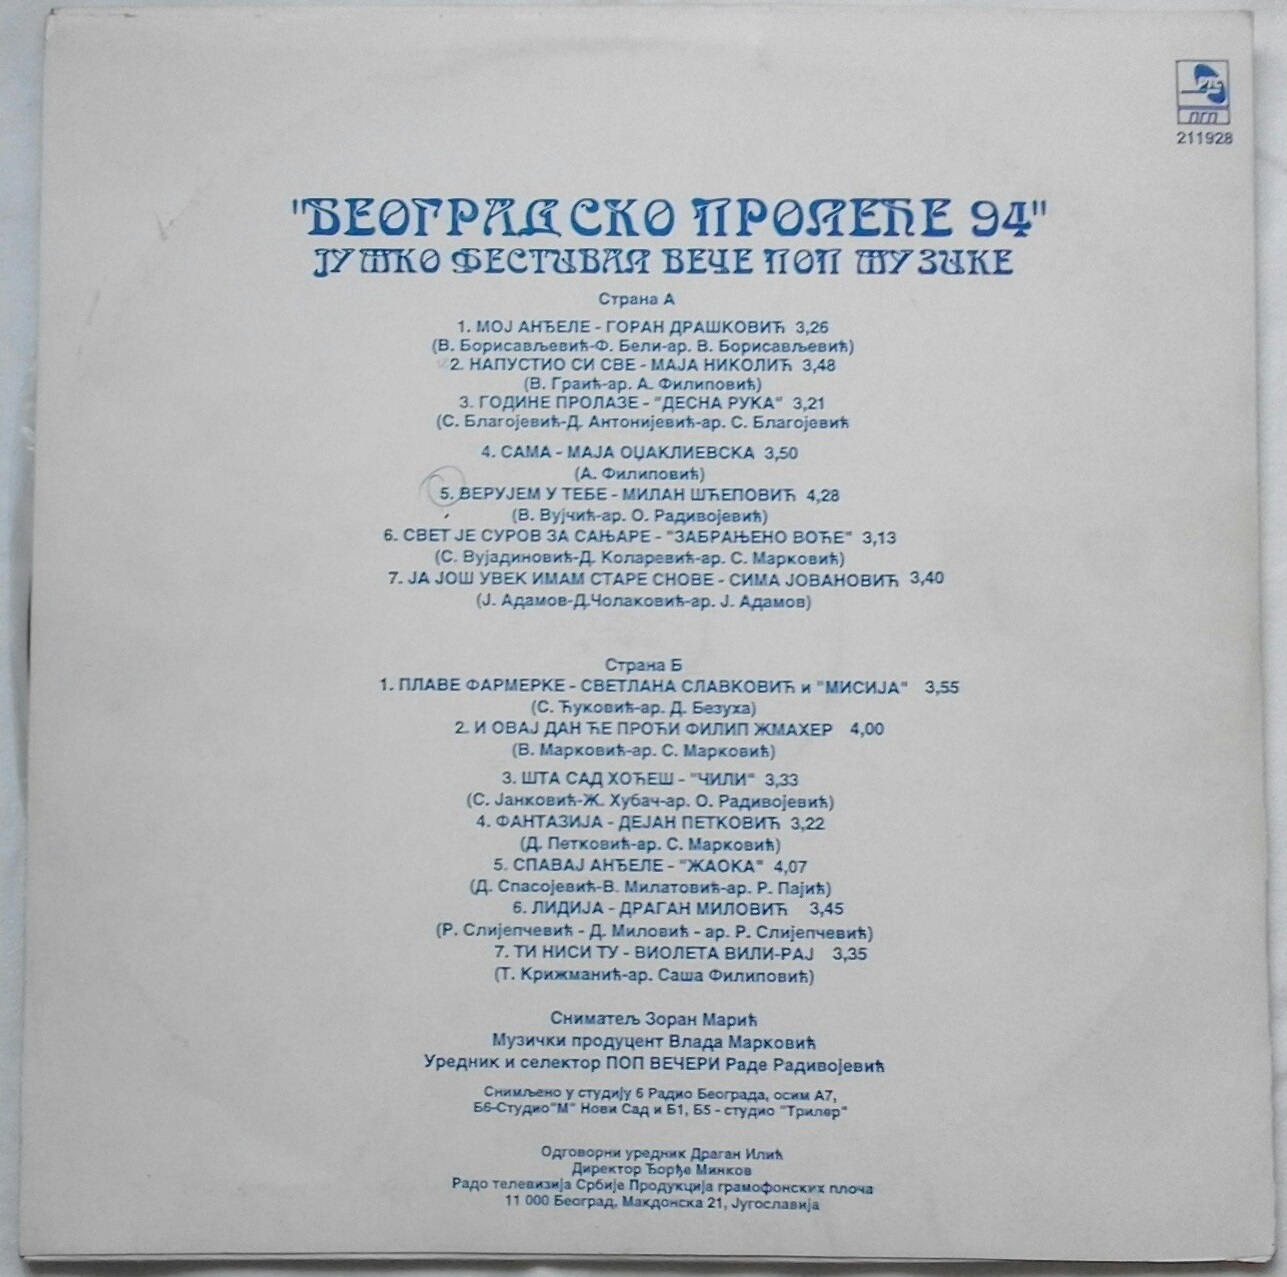 BEOGRADSKO PROLECE 1994 b